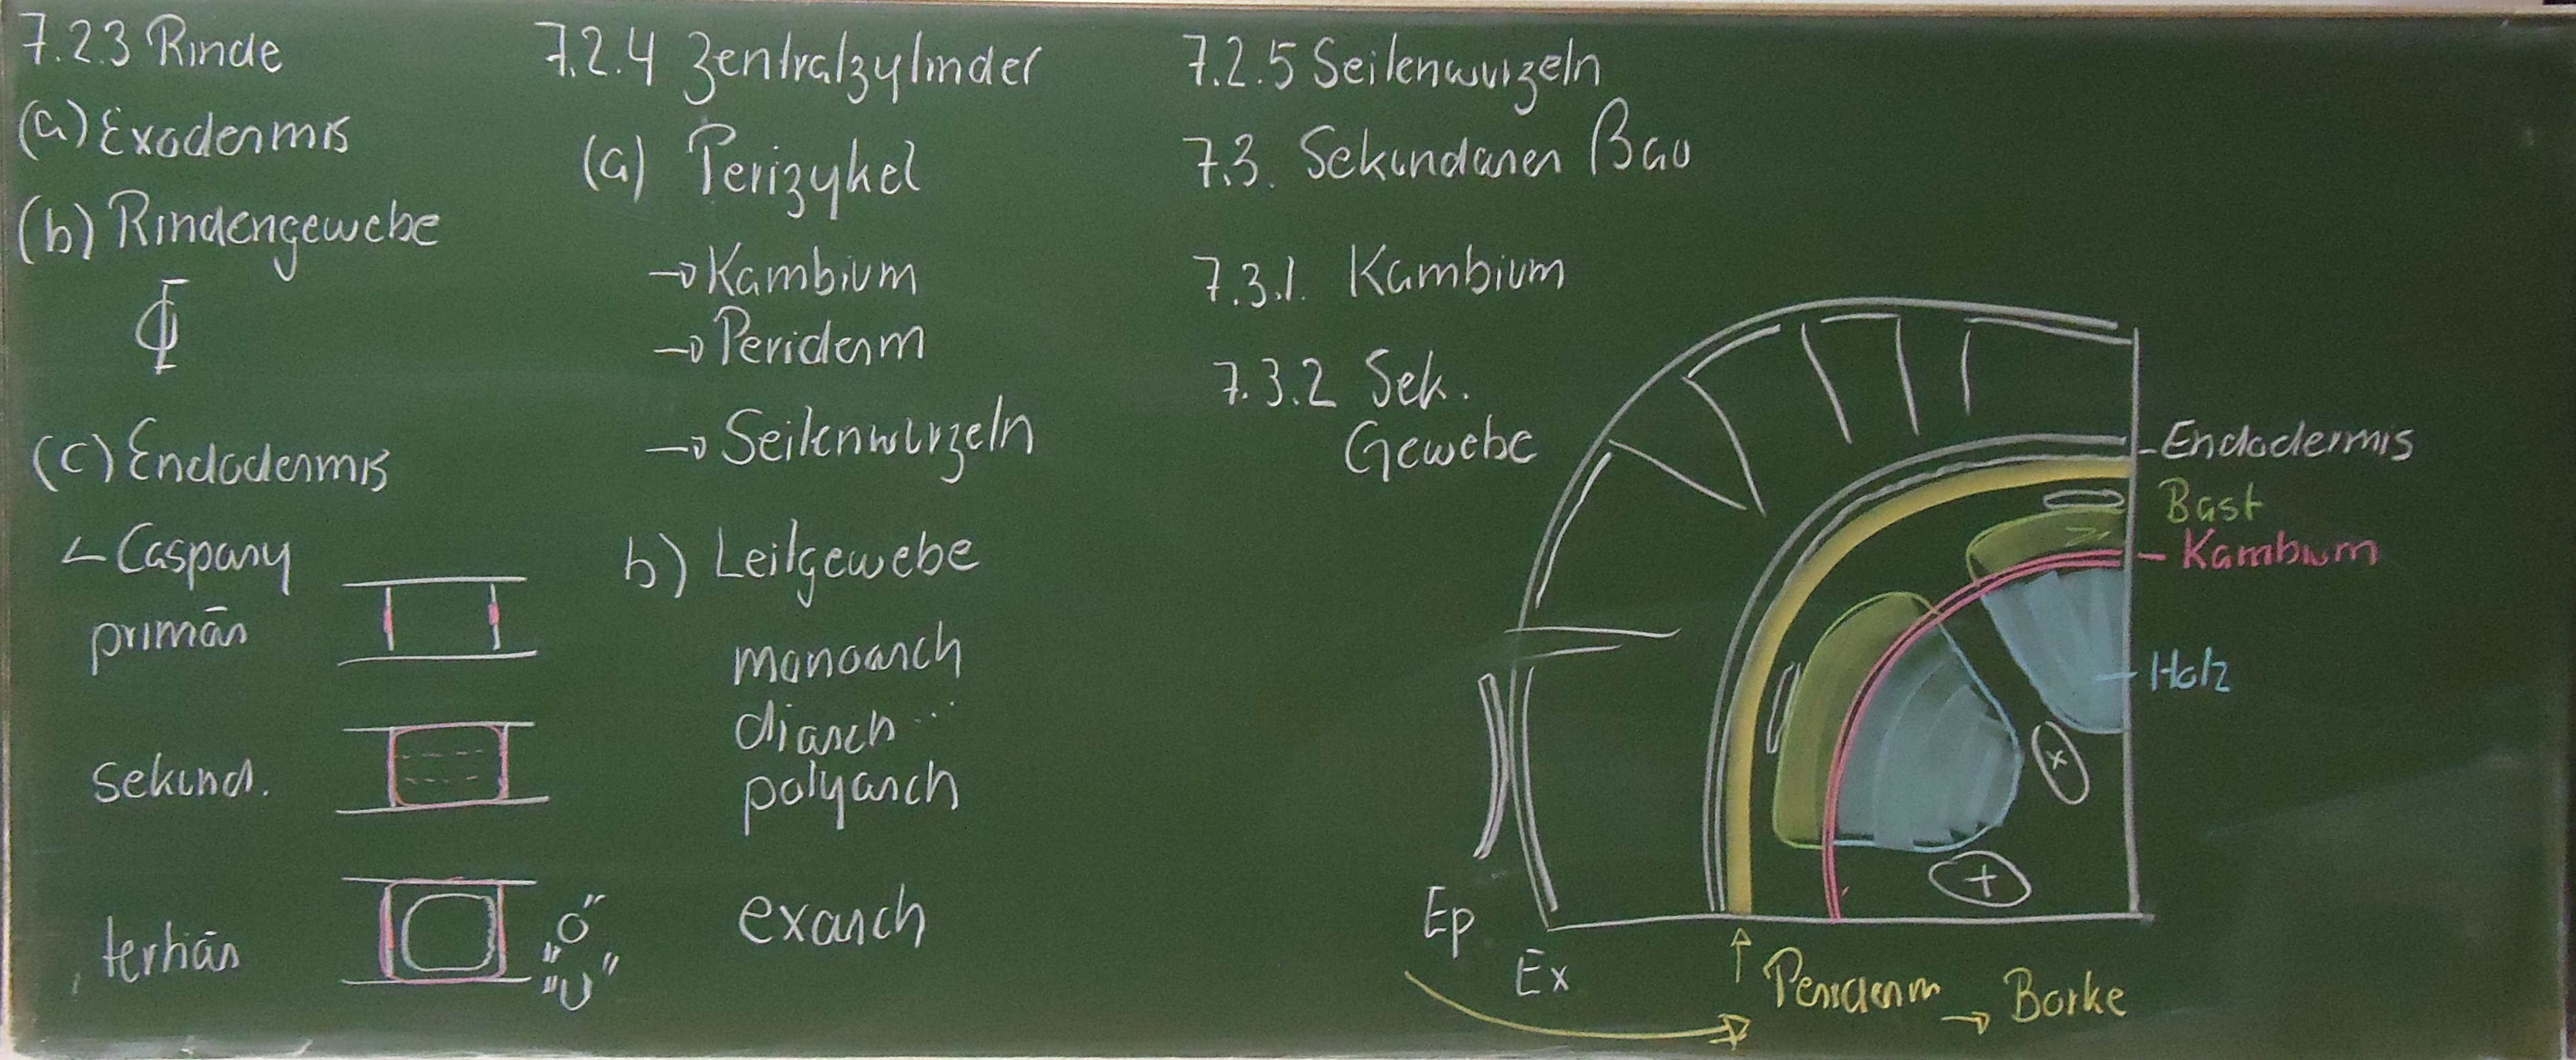 7. Anatomie der Wurzel - Ulm University